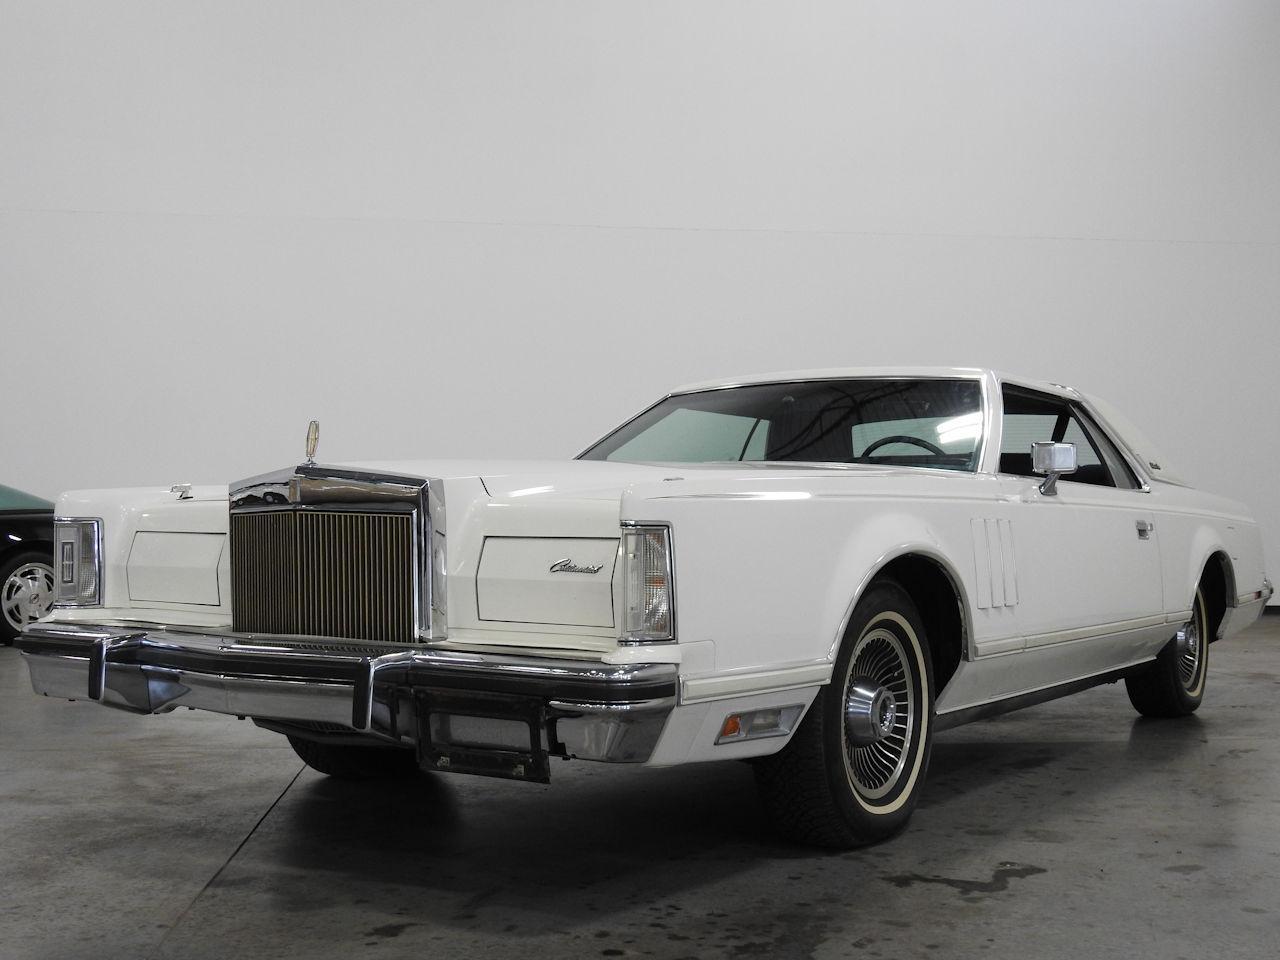 1979 Lincoln MKV 48